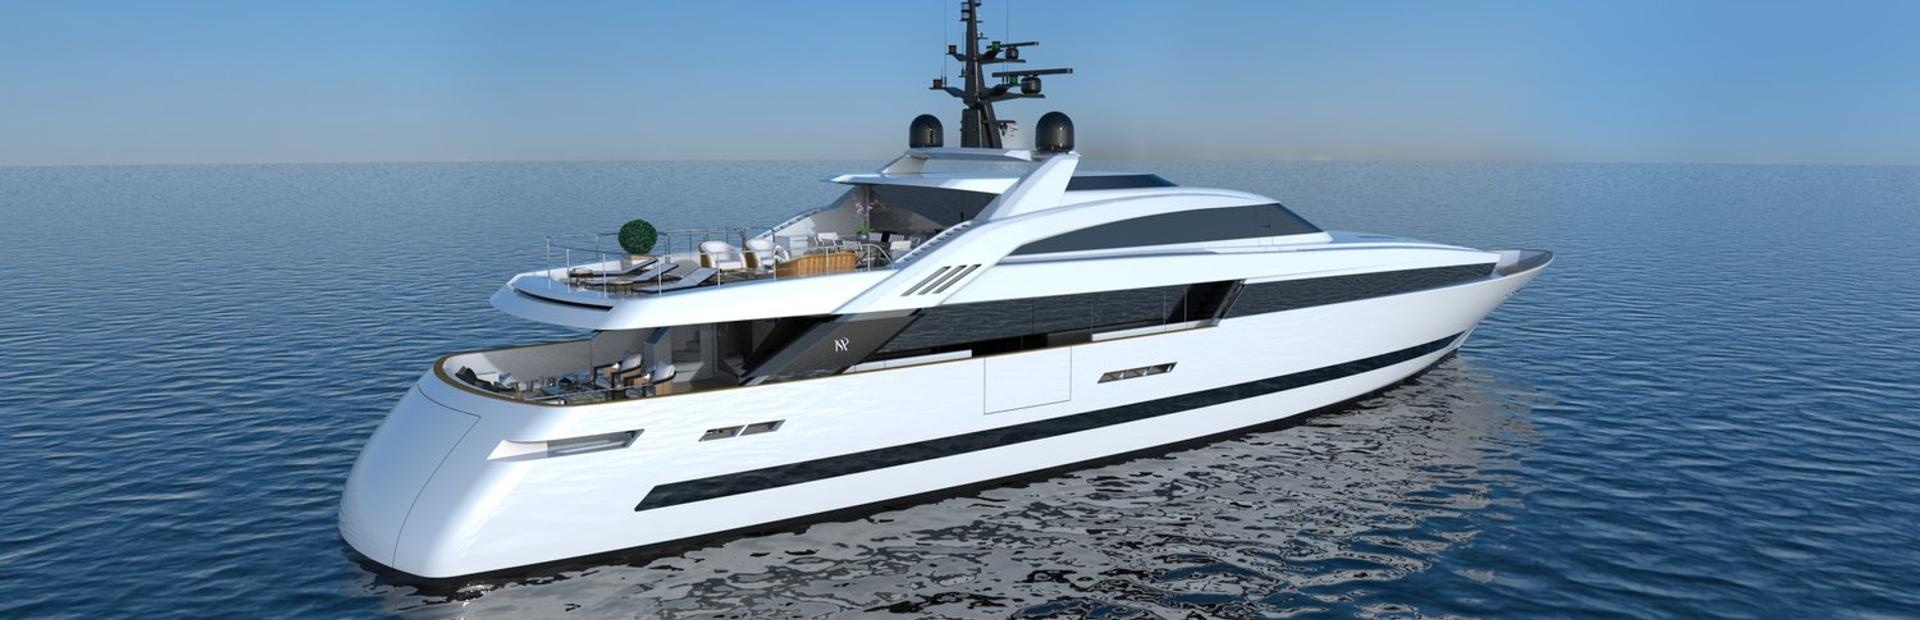 Alloy 43 Yacht Charter